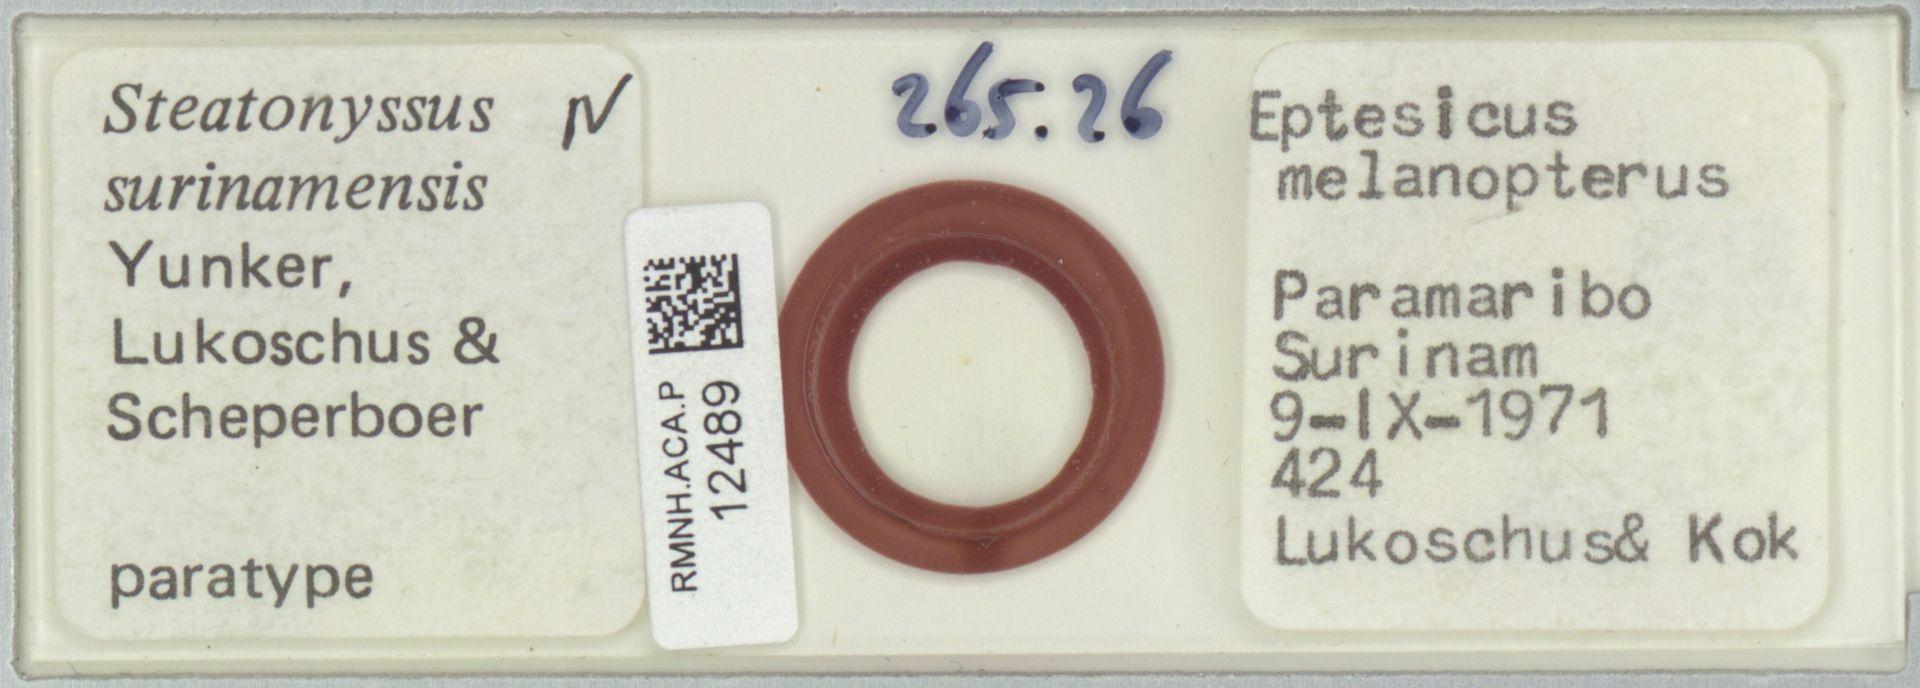 RMNH.ACA.P.12489   Steatonyssus surinamensis